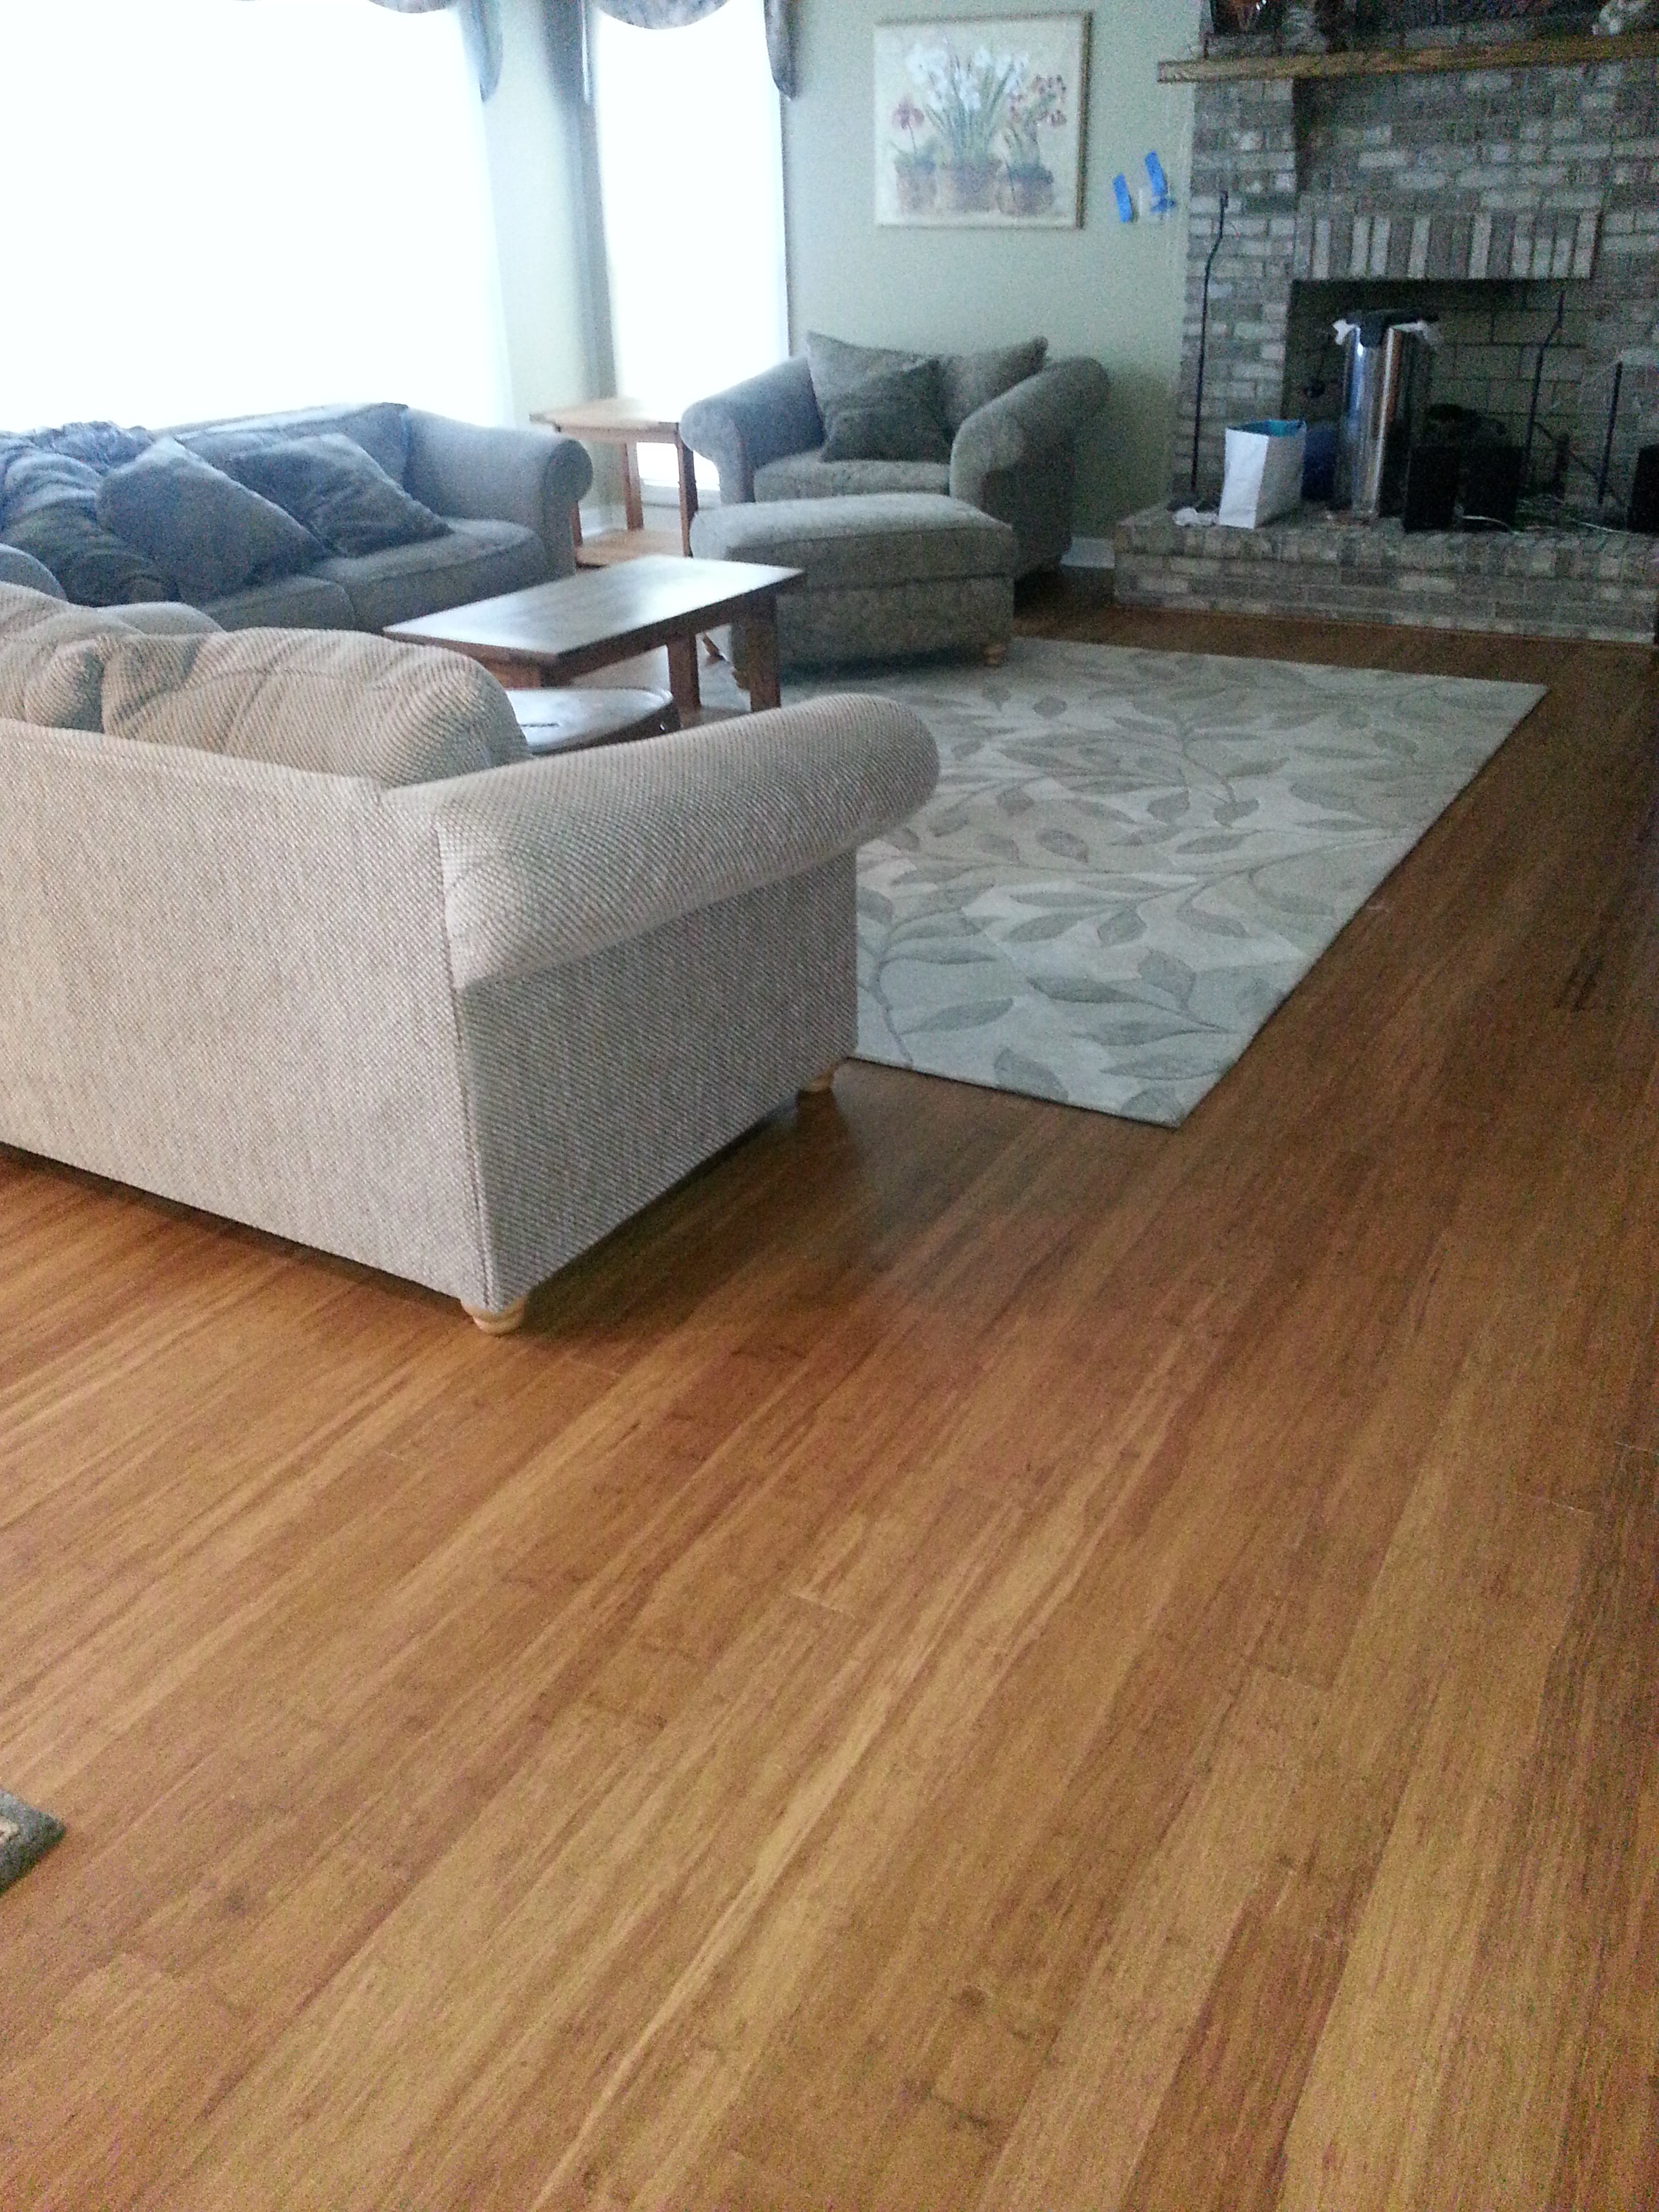 Floorgem services inc columbia md business profile for Columbia flooring inc